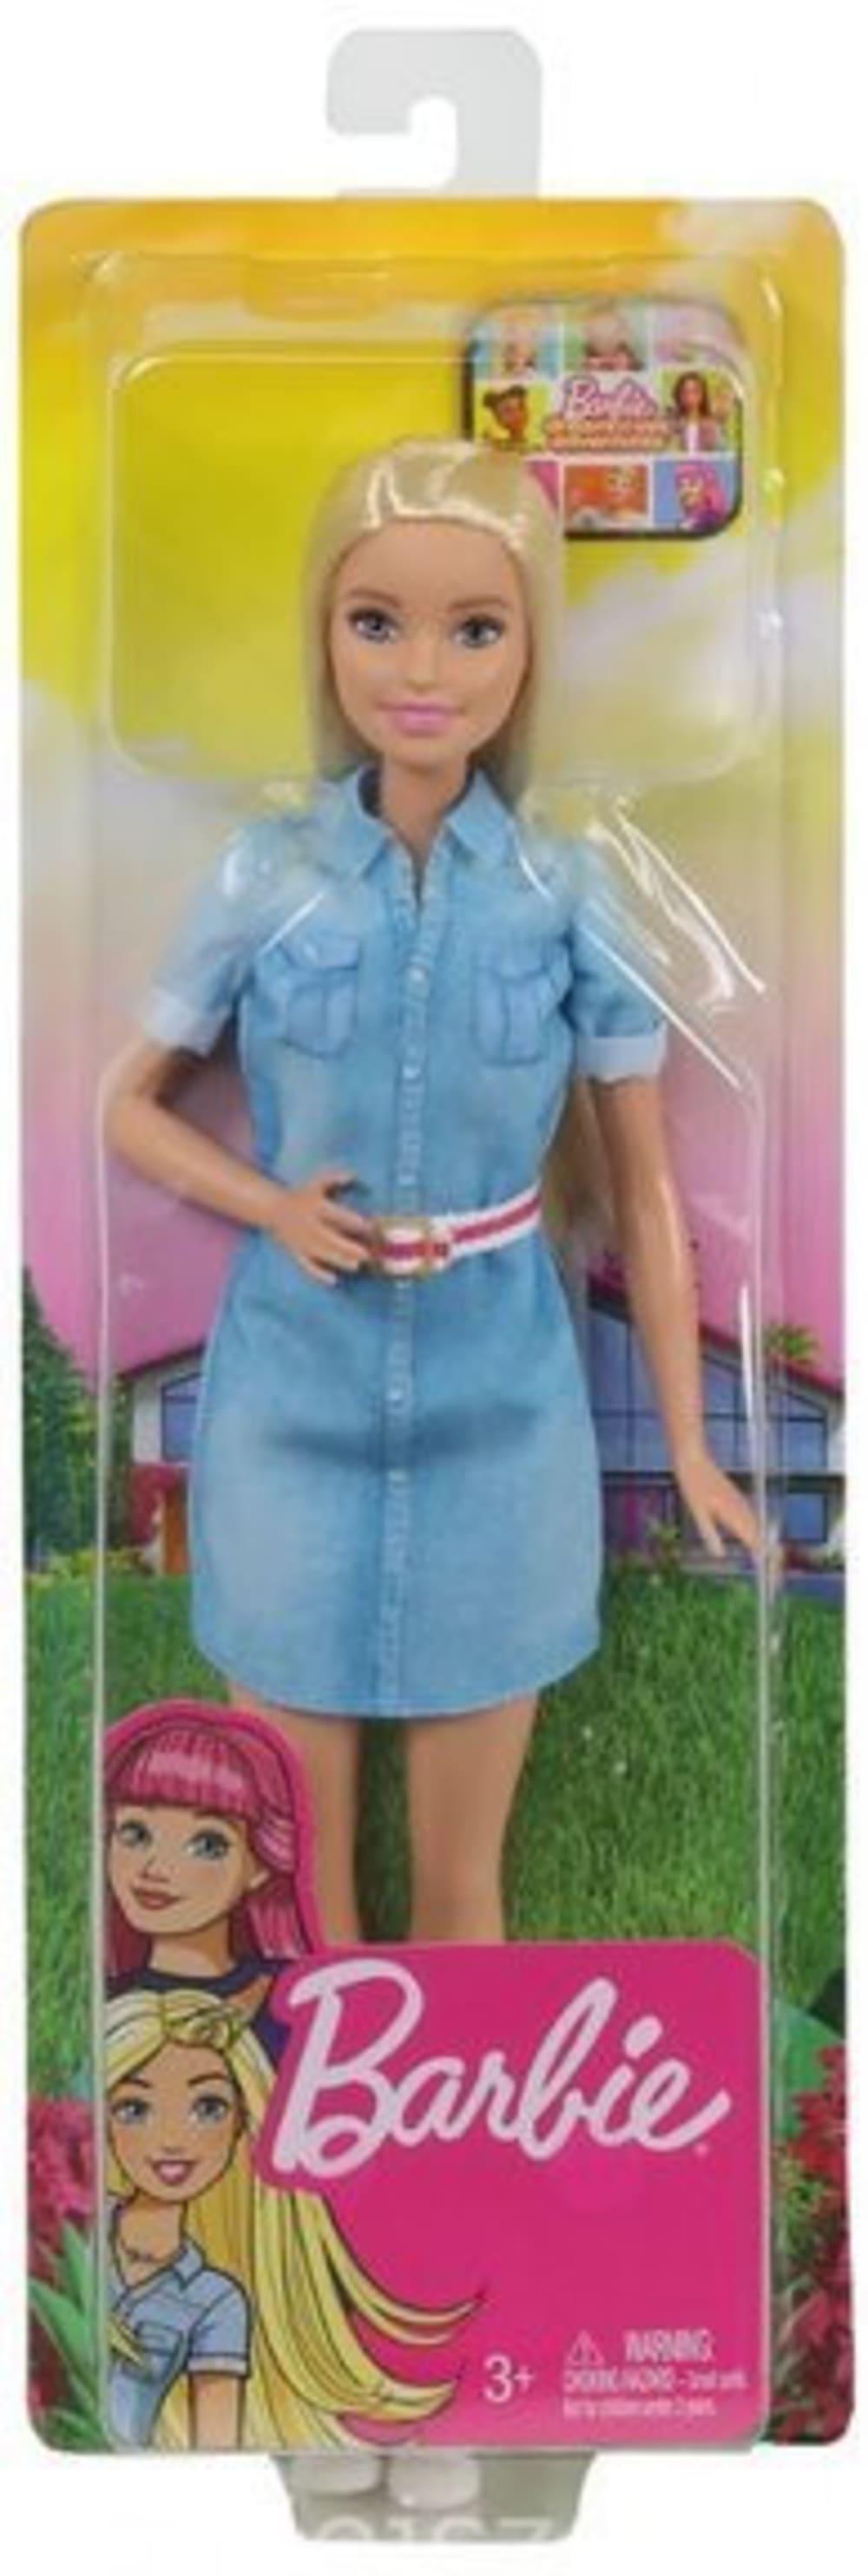 Lalka podstawowa Barbie